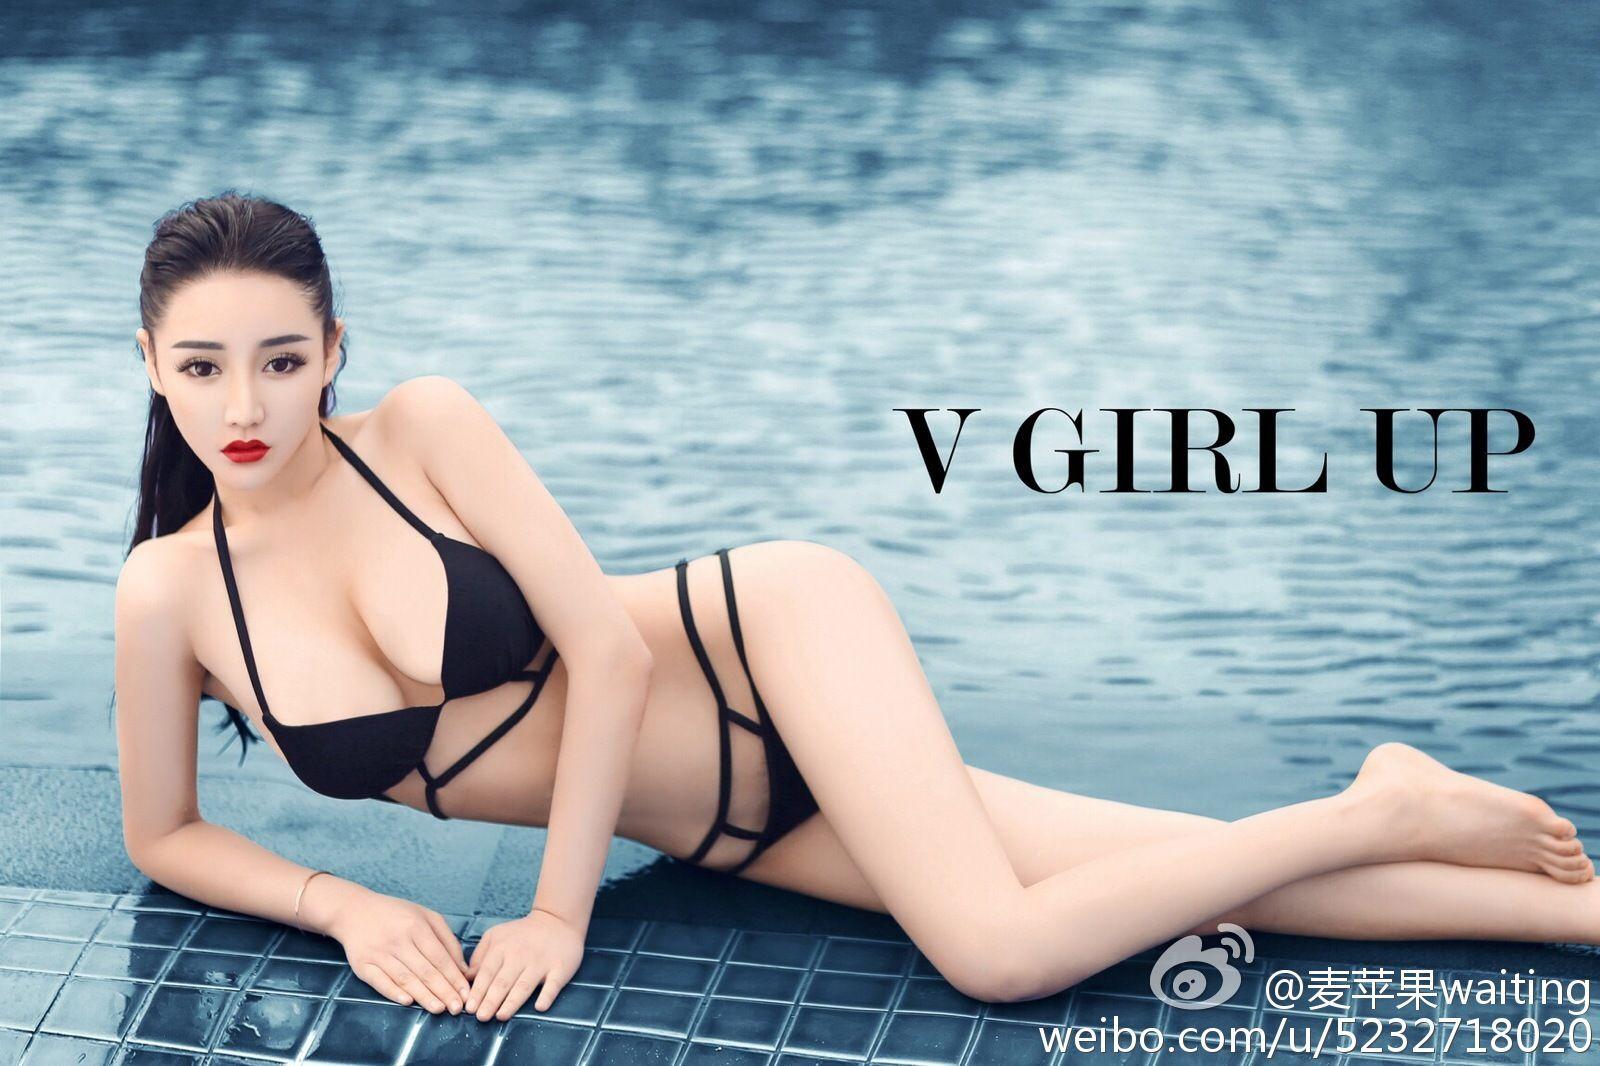 ICloud Mai Ping Guo nude (84 photos), Ass, Hot, Instagram, butt 2019